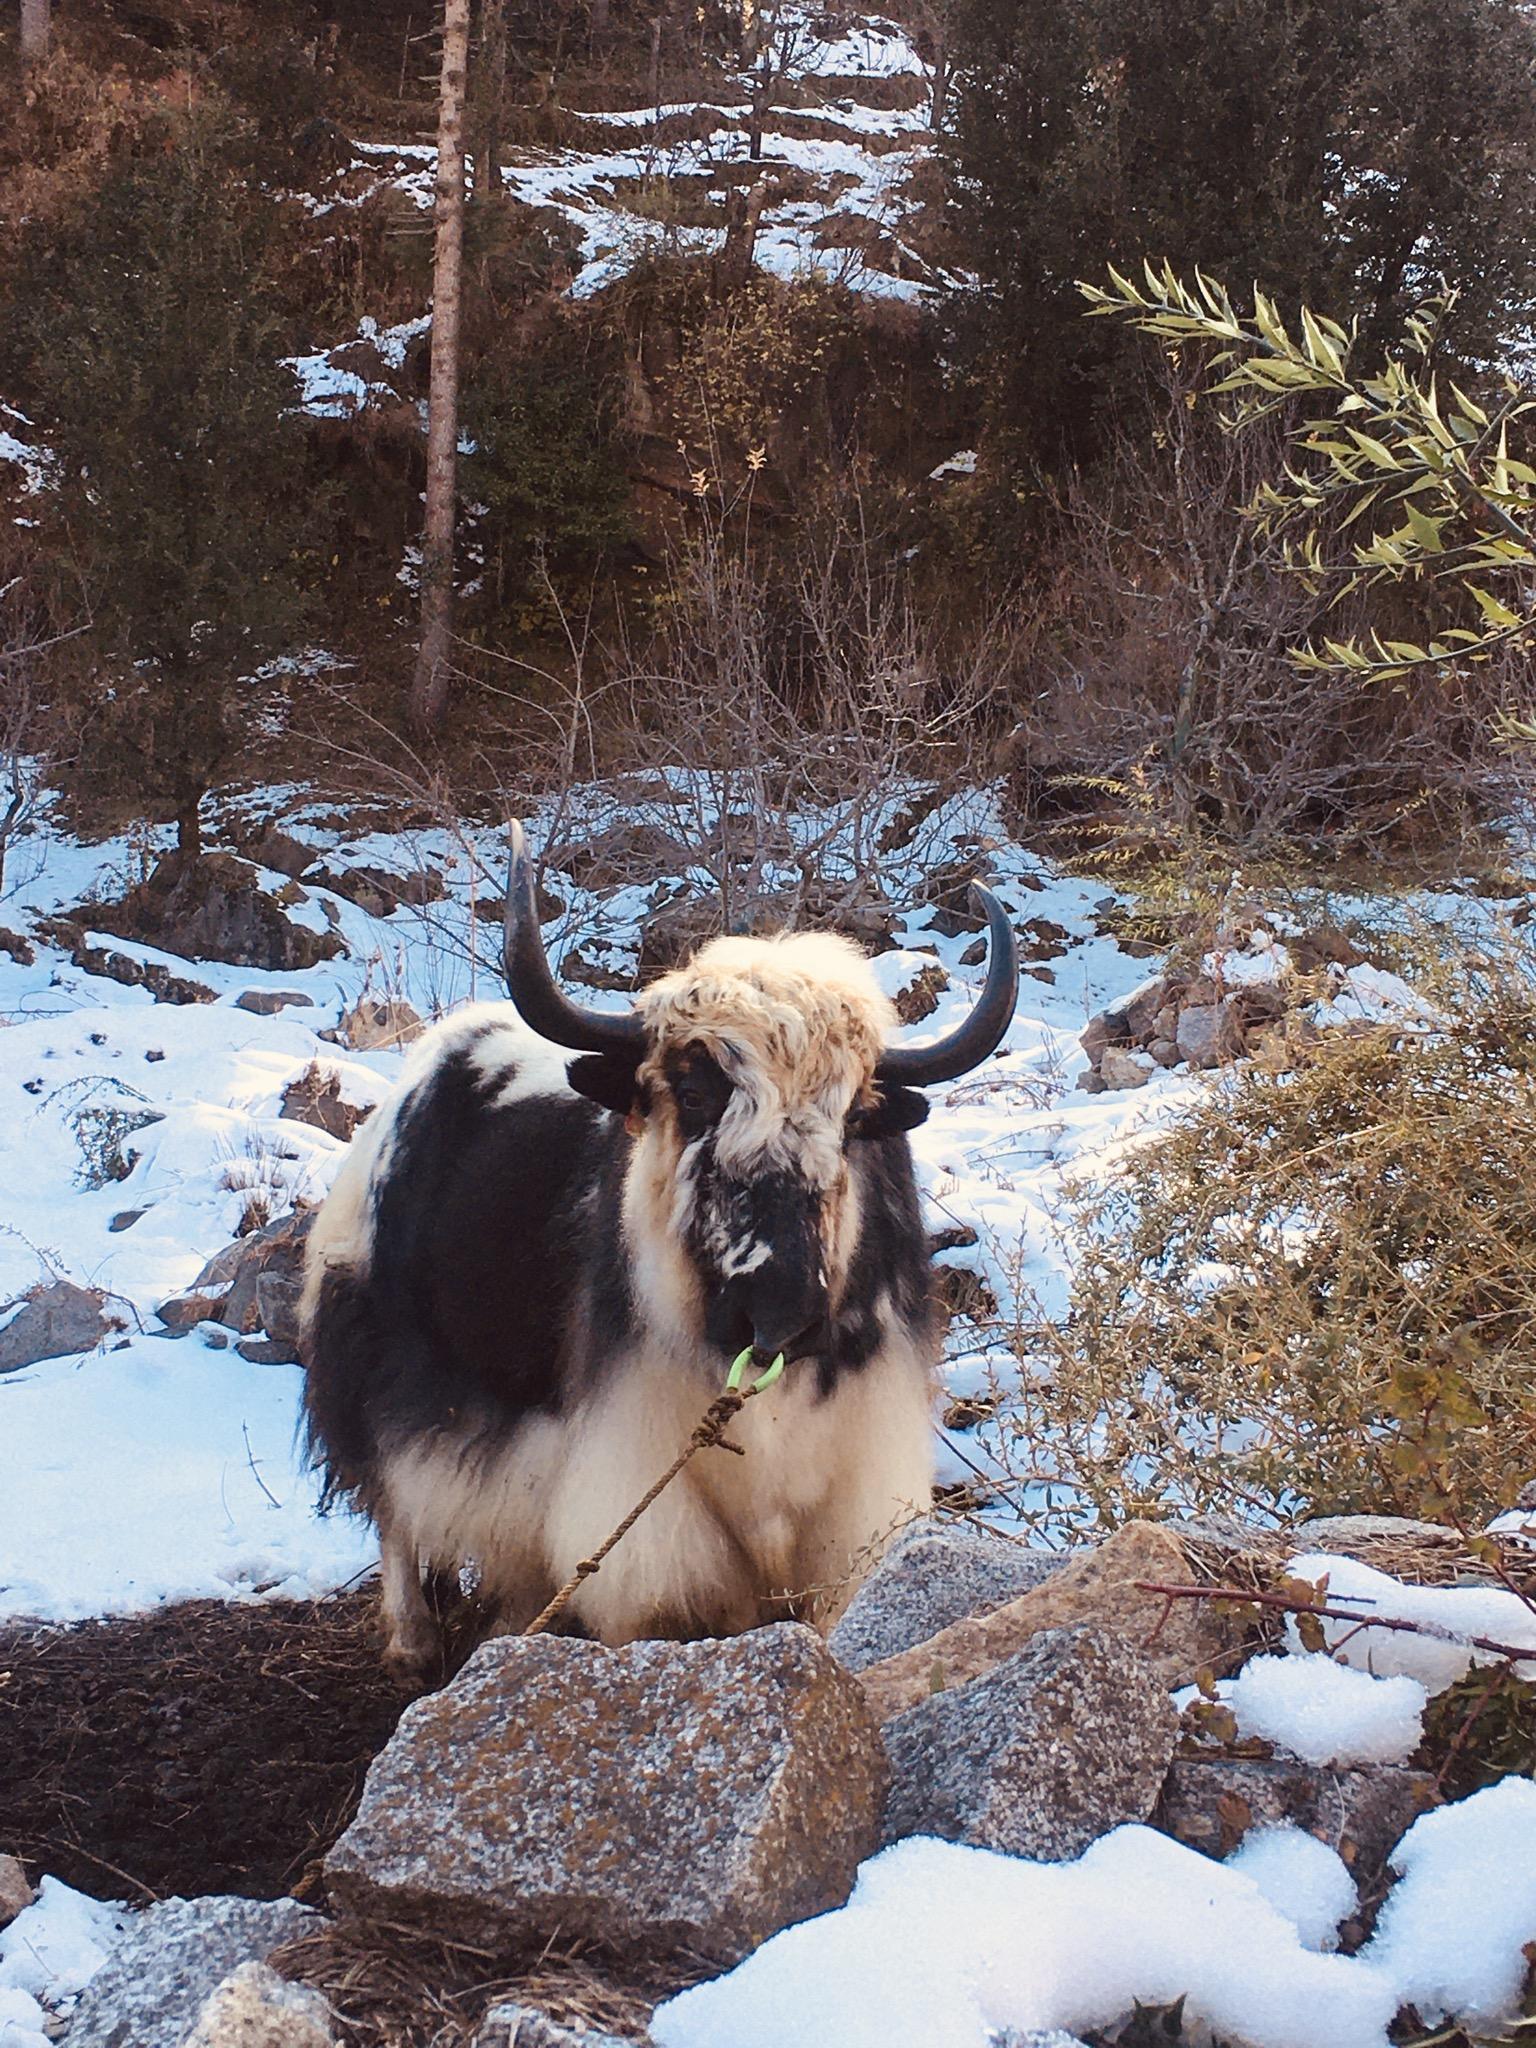 Yak in snow